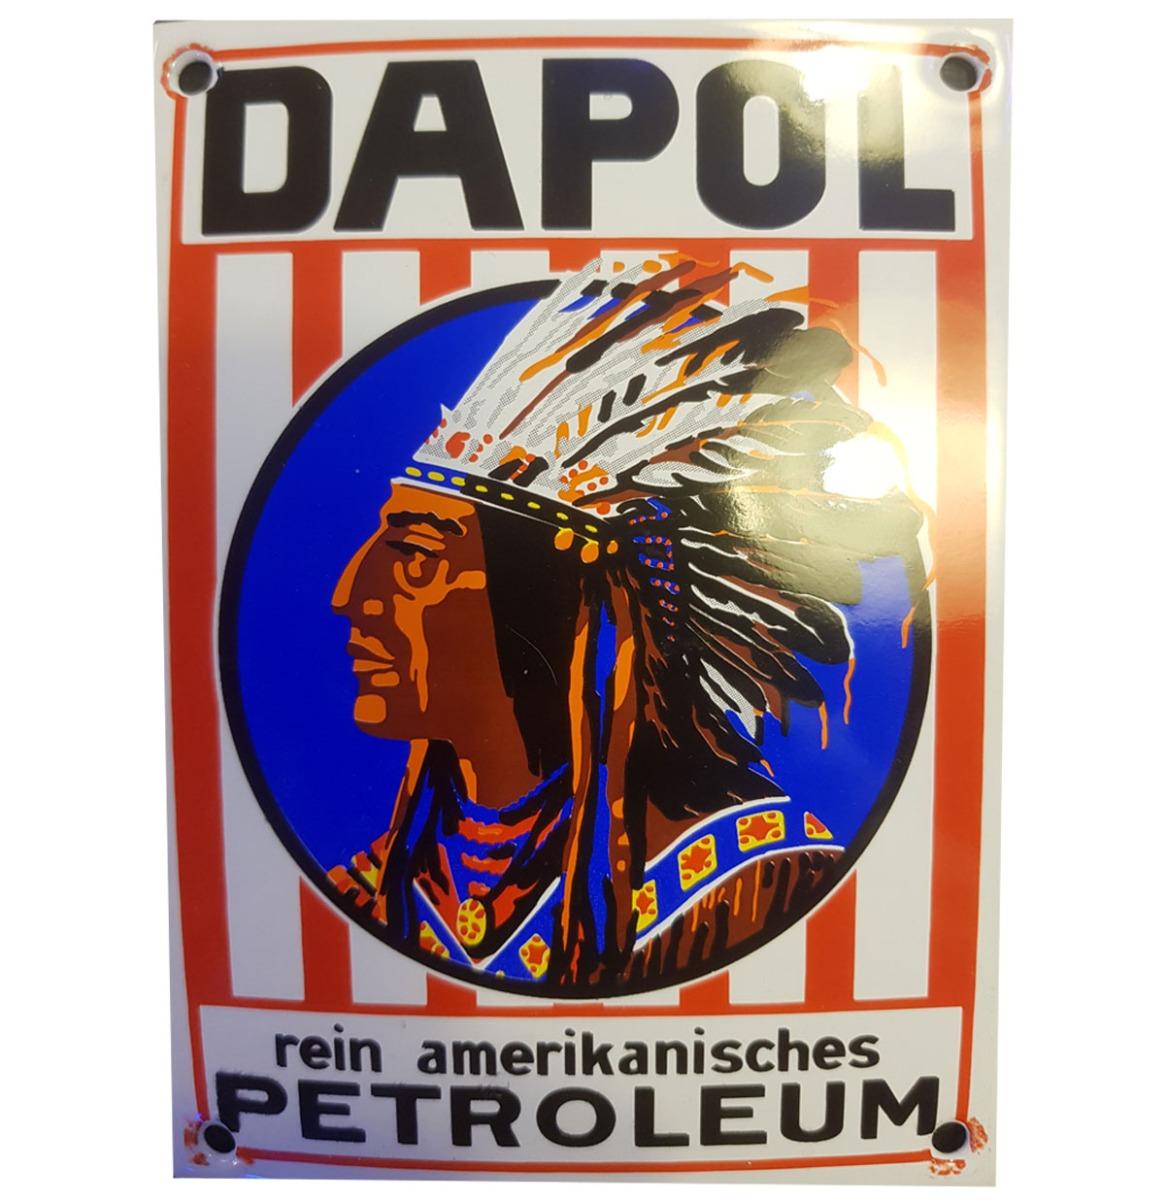 Dapol Rein Amerikanisches Petroleum Emaille Bord - 14 x 11 cm